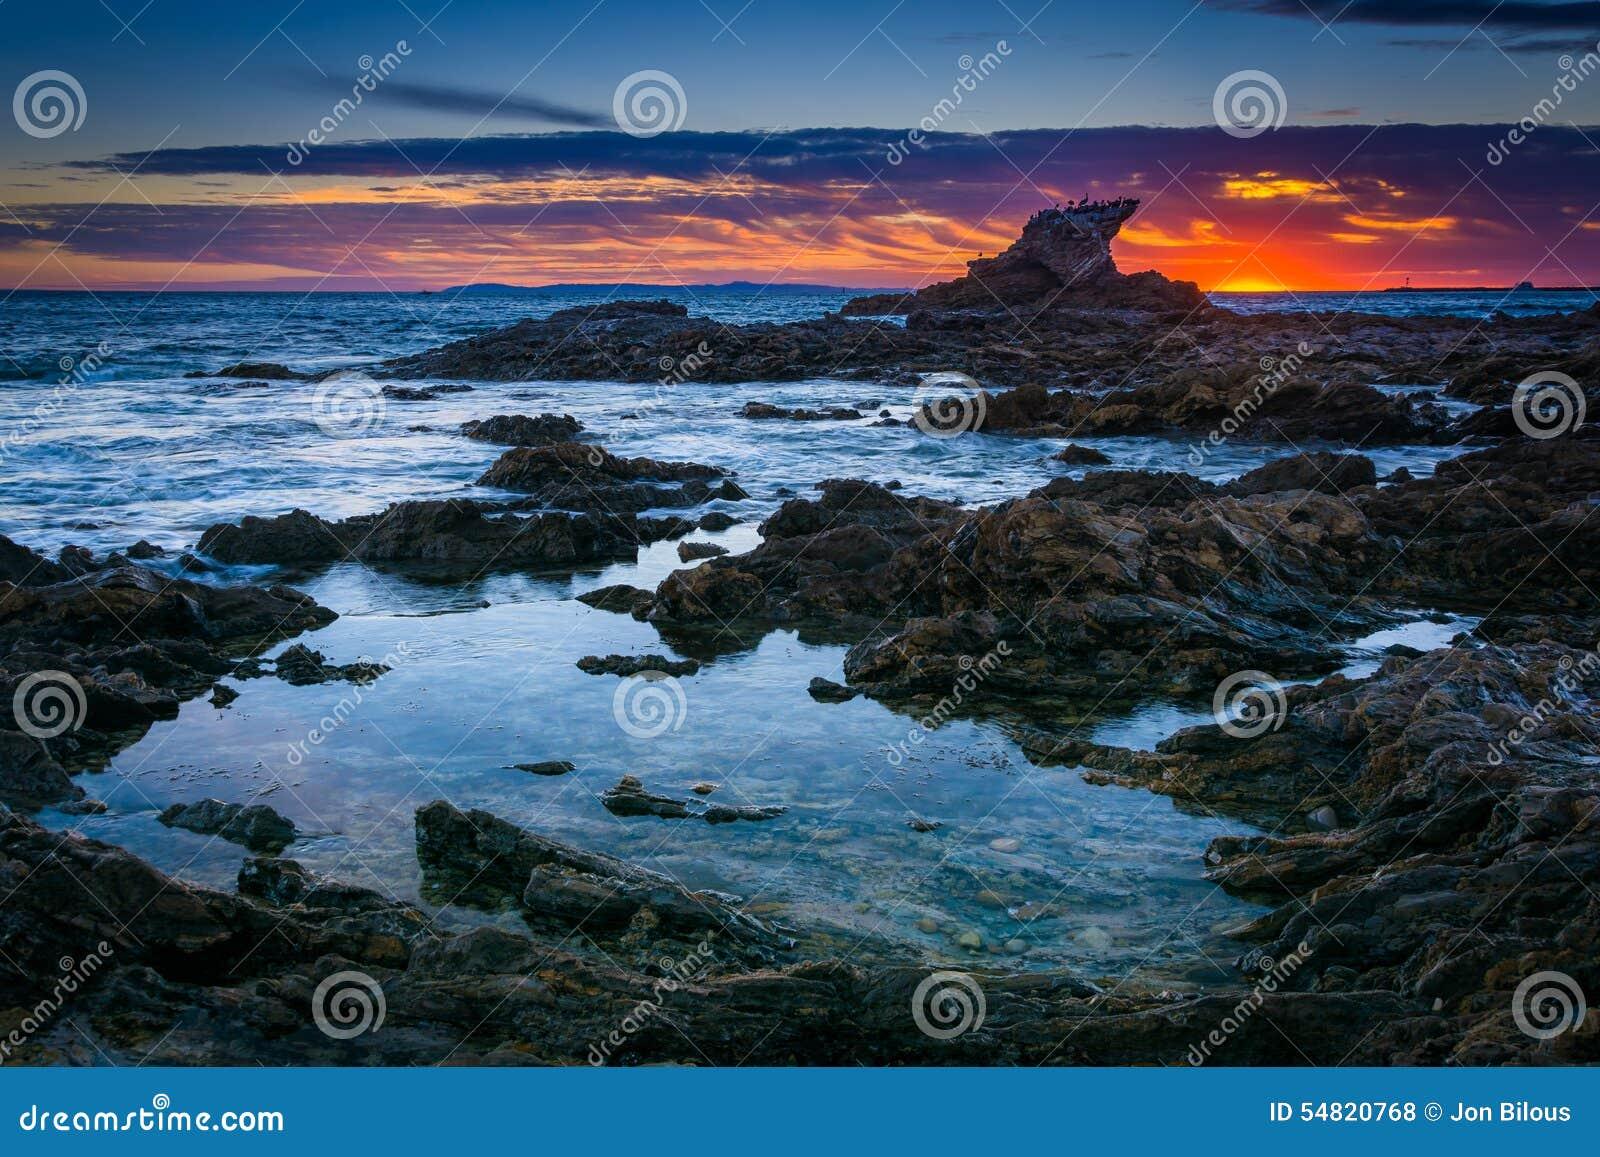 Tide pools at sunset, at Little Corona Beach, in Corona del Mar,